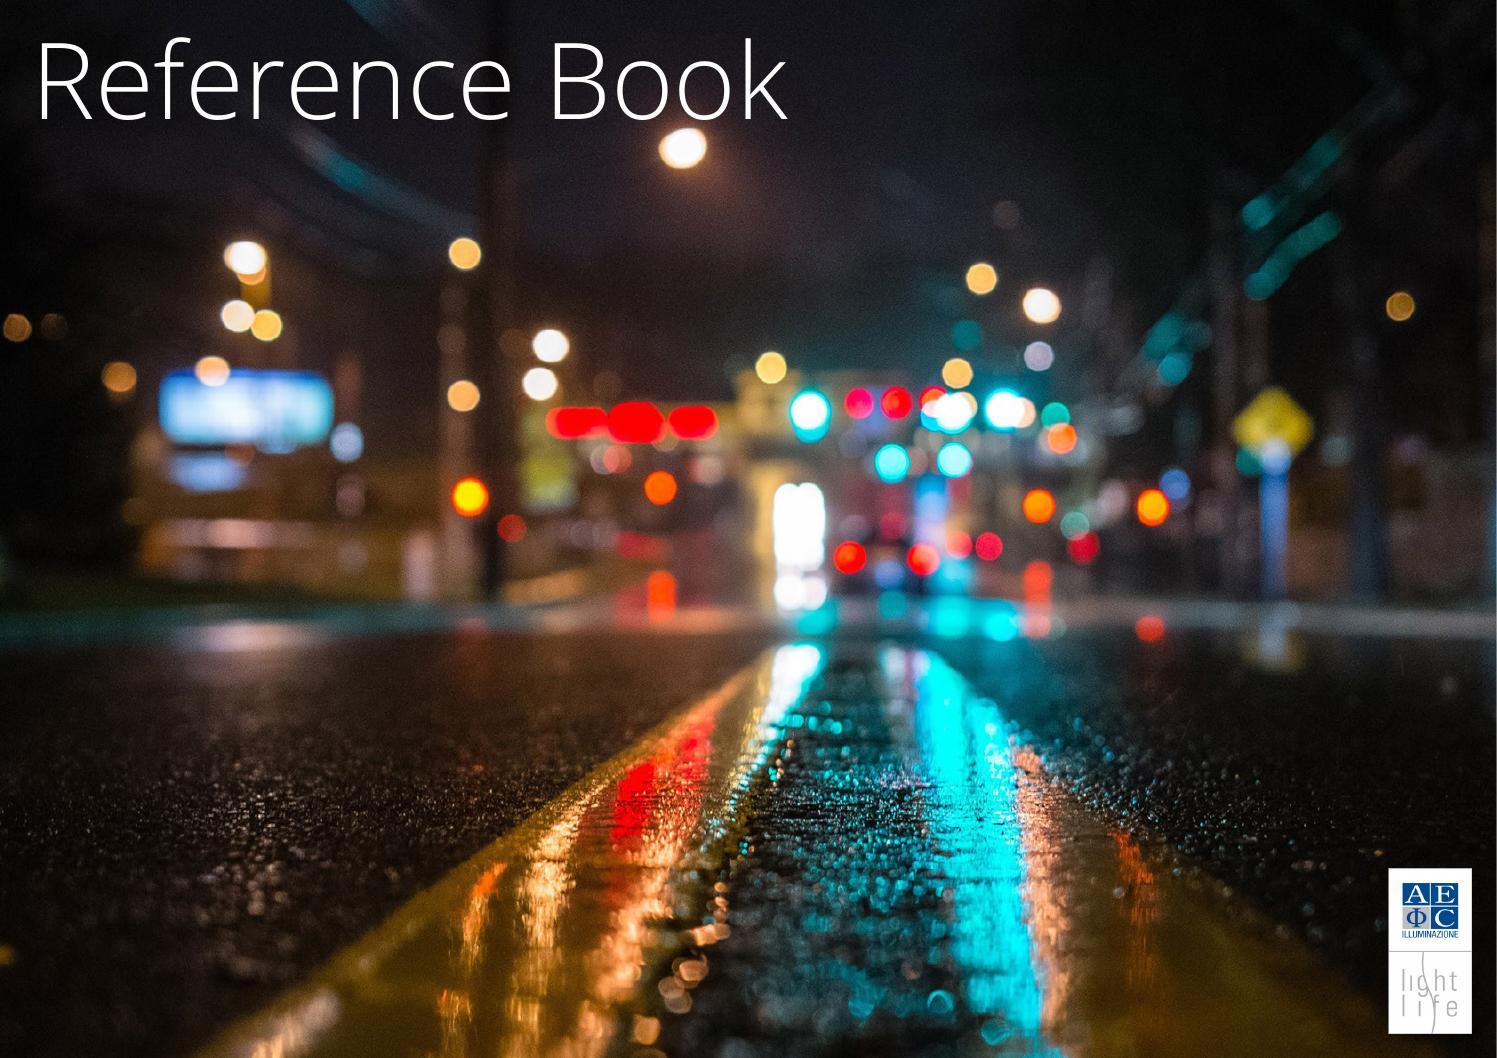 Aec Illuminazione Lanterna Firenze : Aec reference book it by aec illuminazione srl issuu